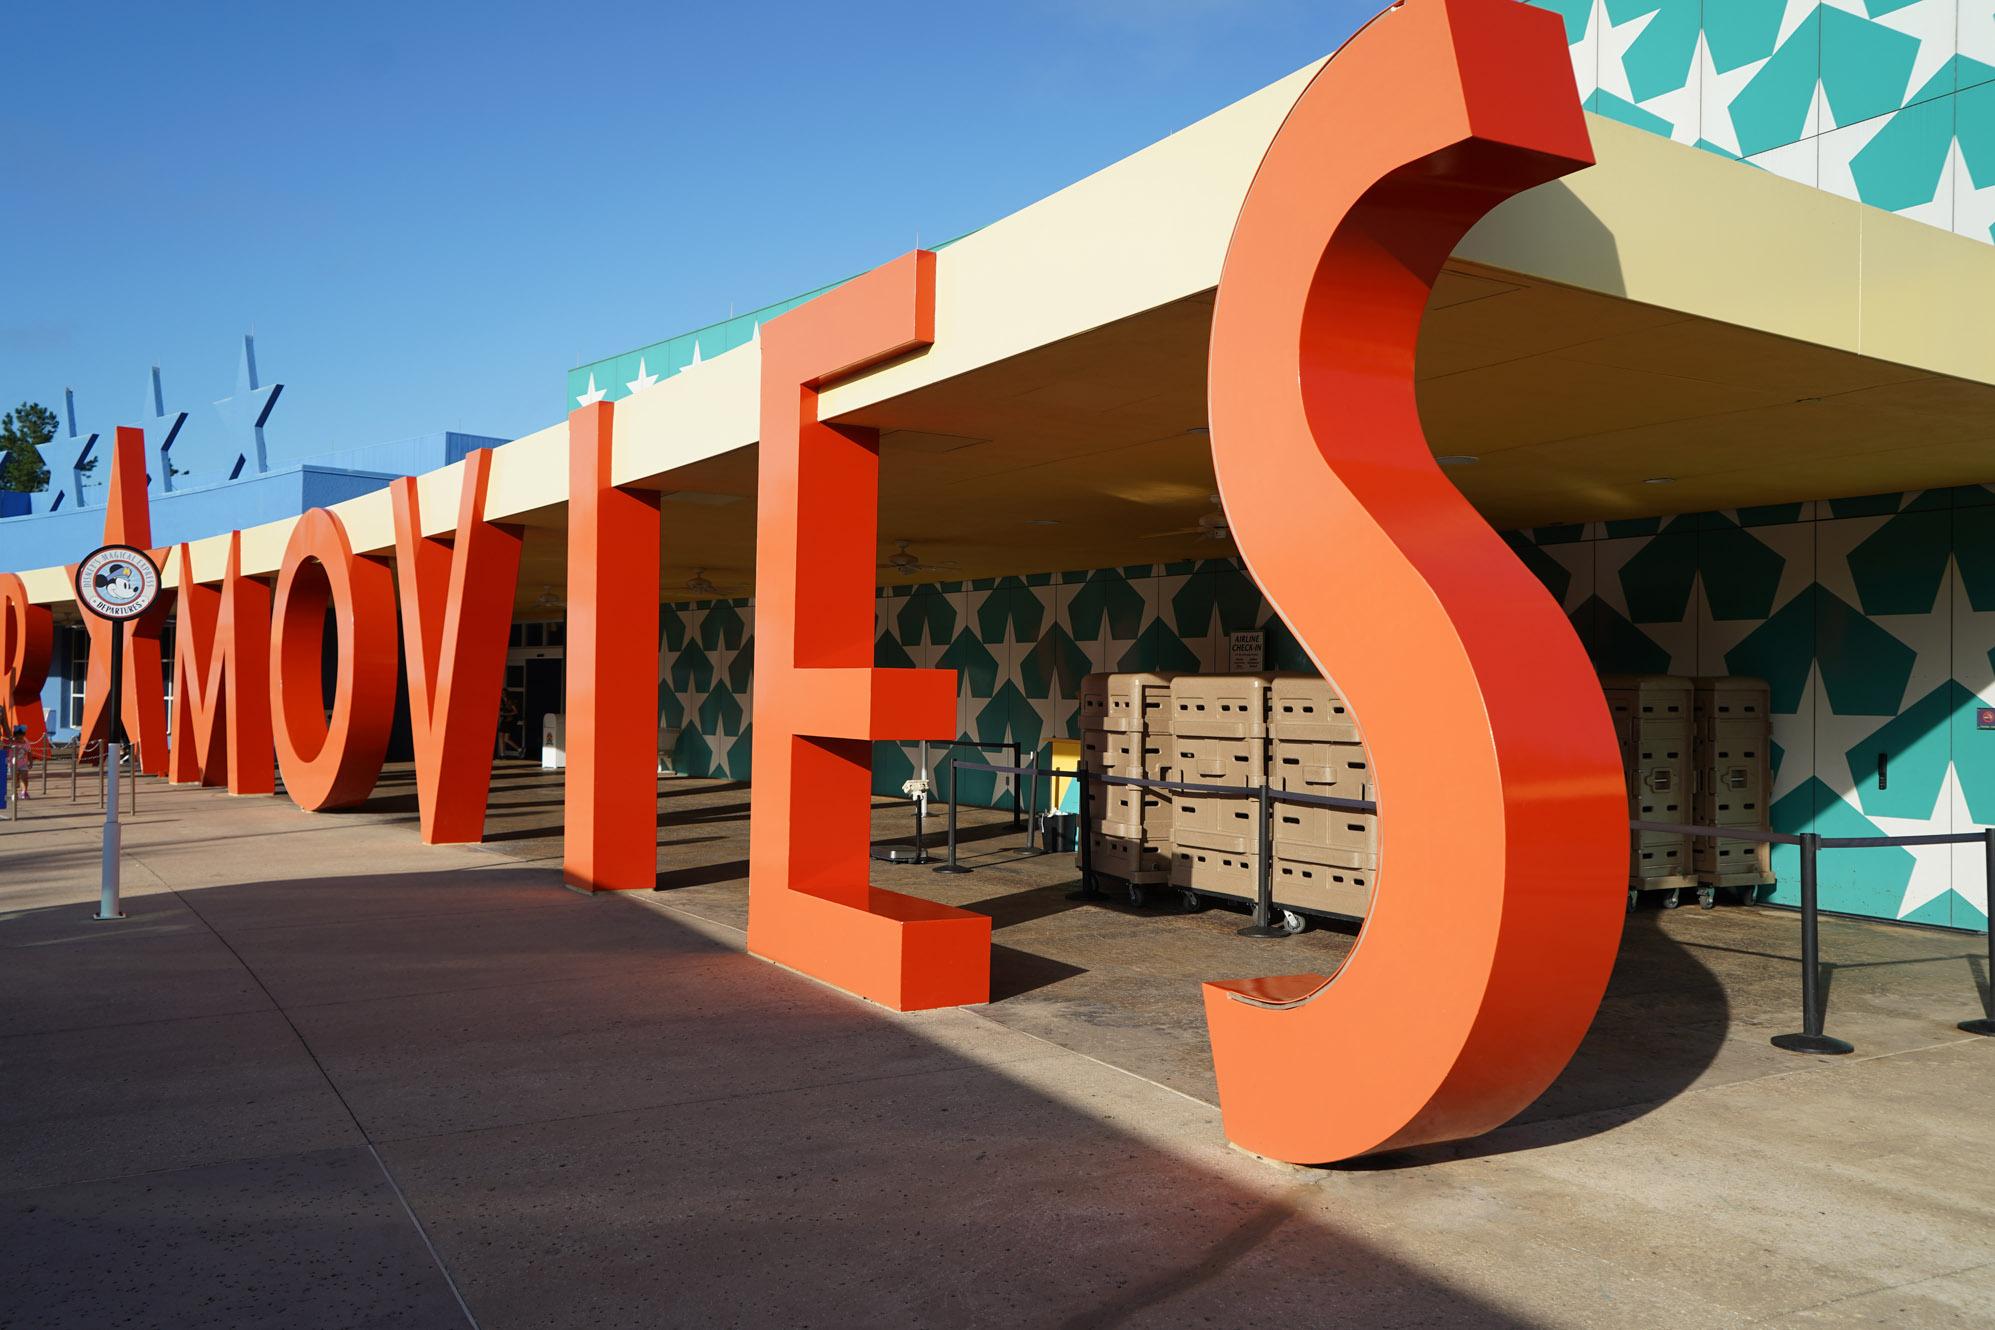 Disney Value Resorts